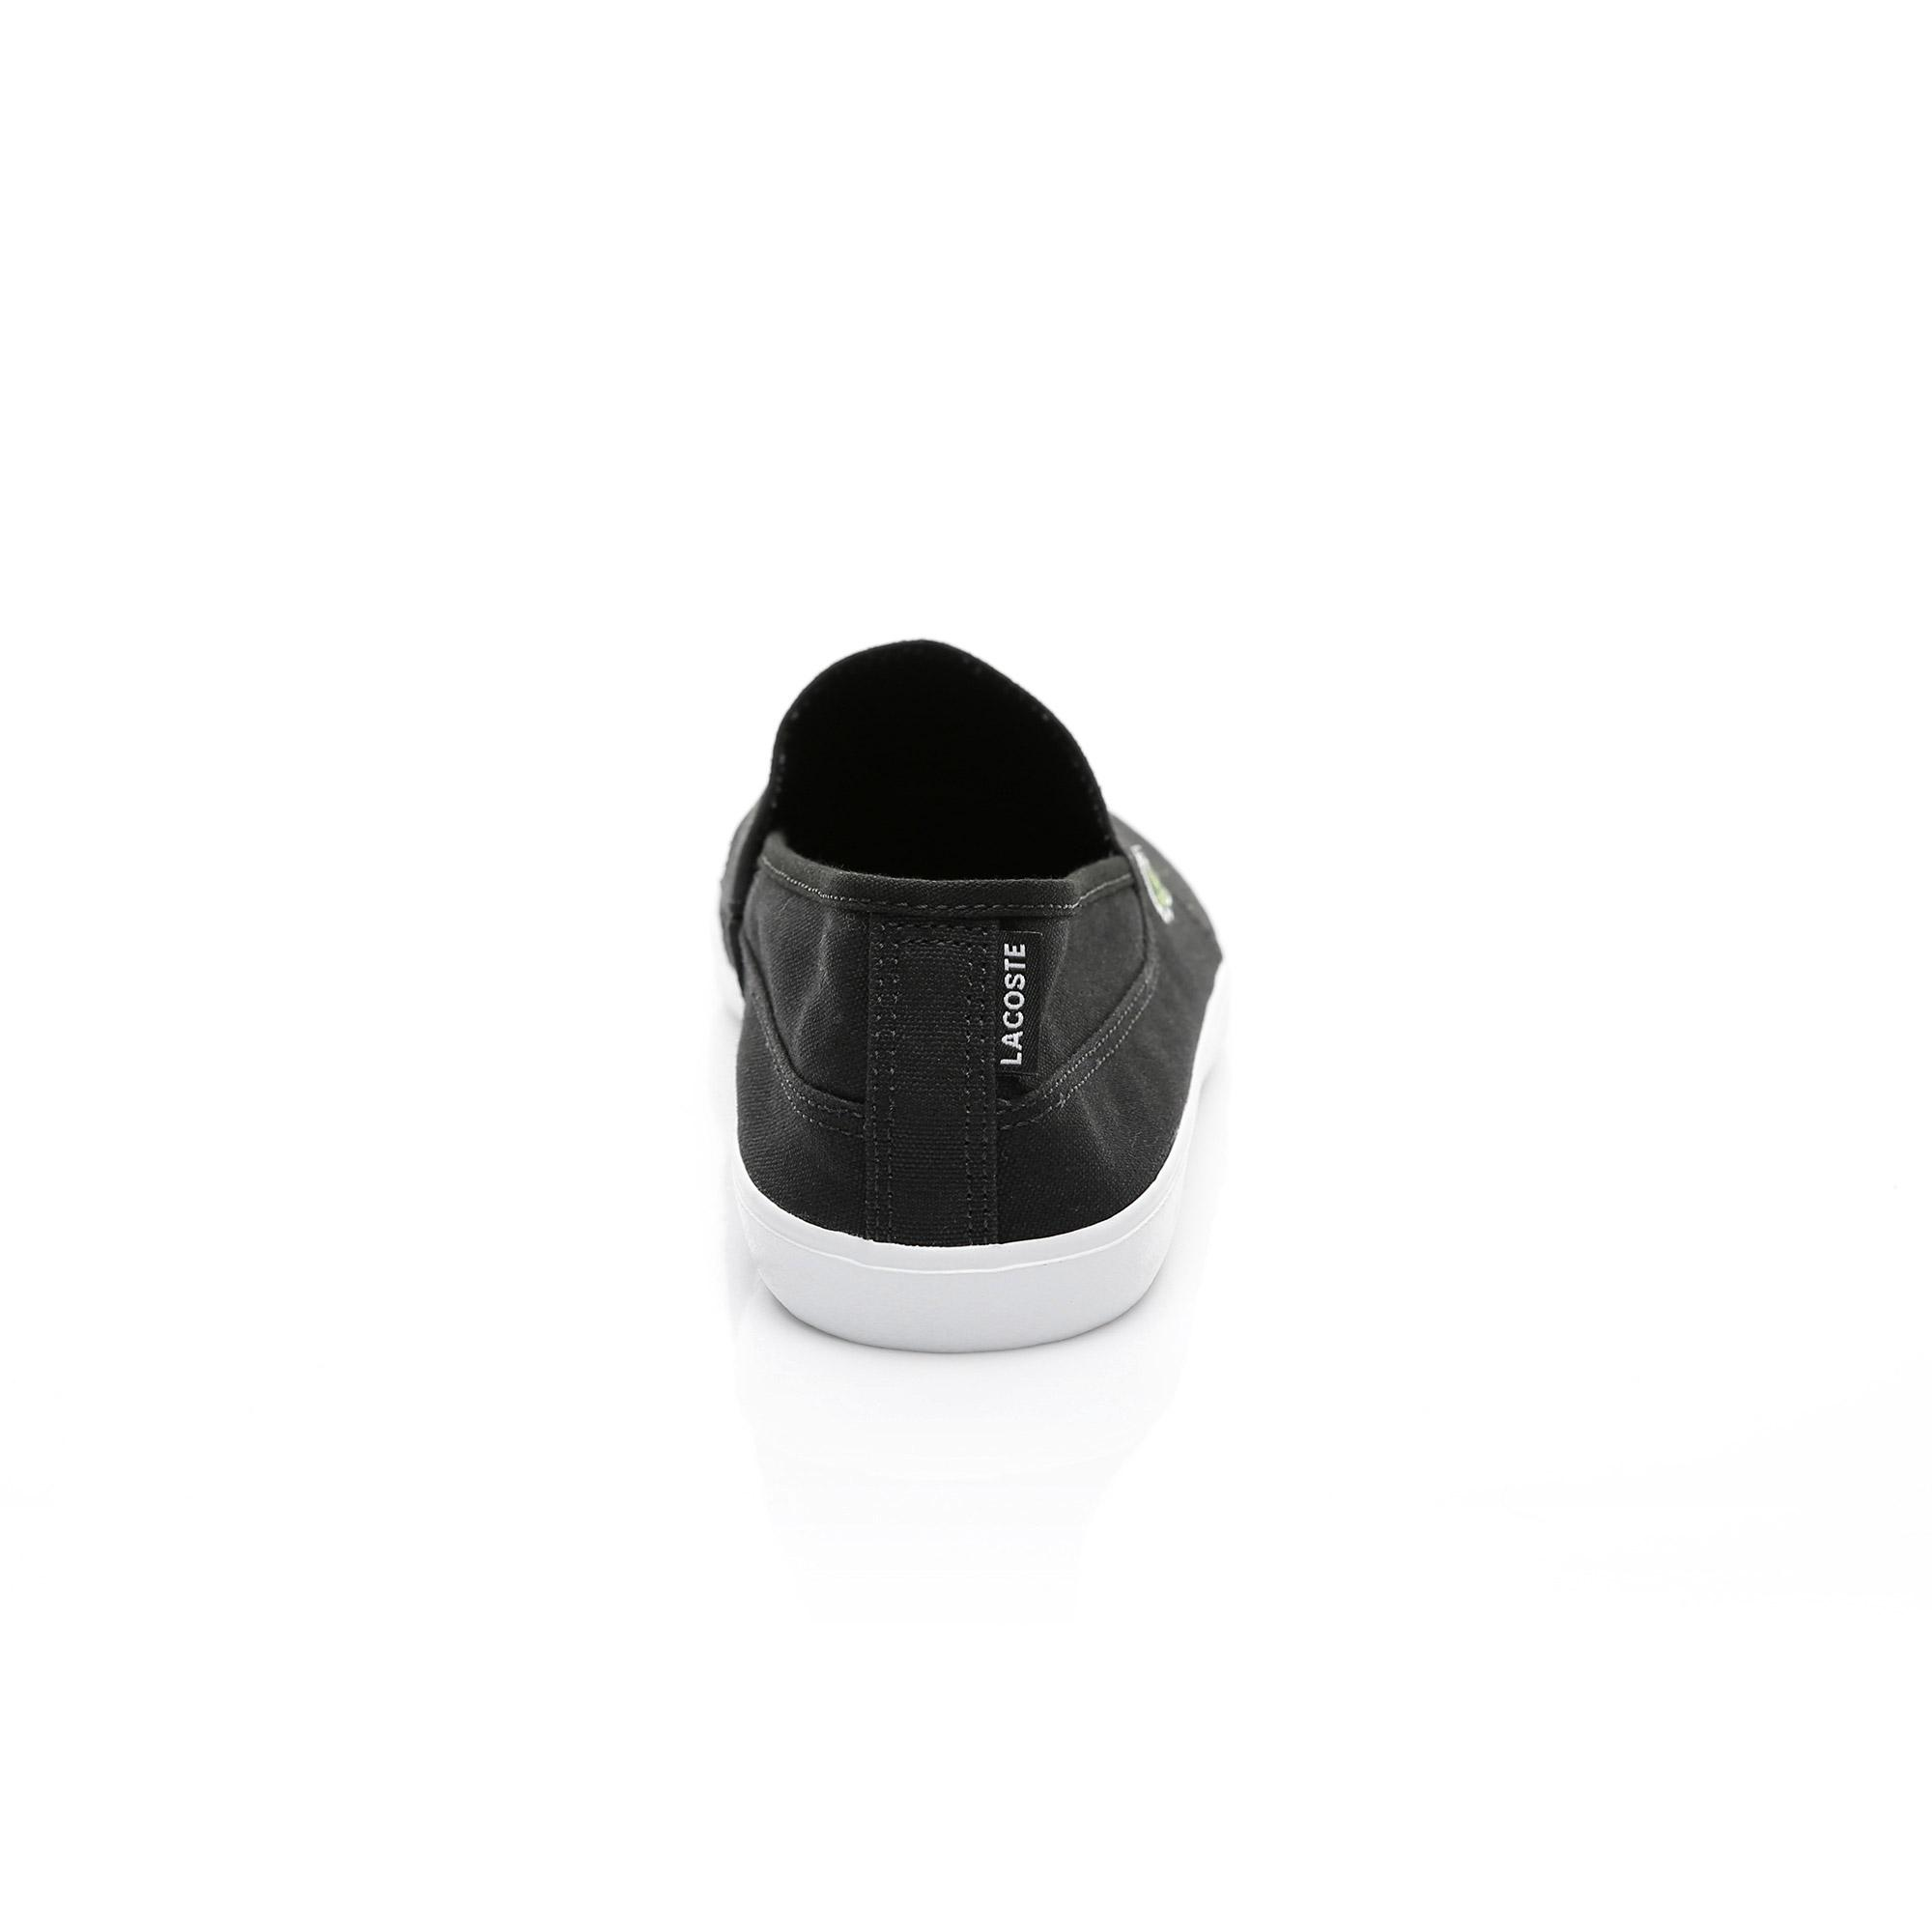 Lacoste Męskie buty slip-on Graduate ze skóry Premium